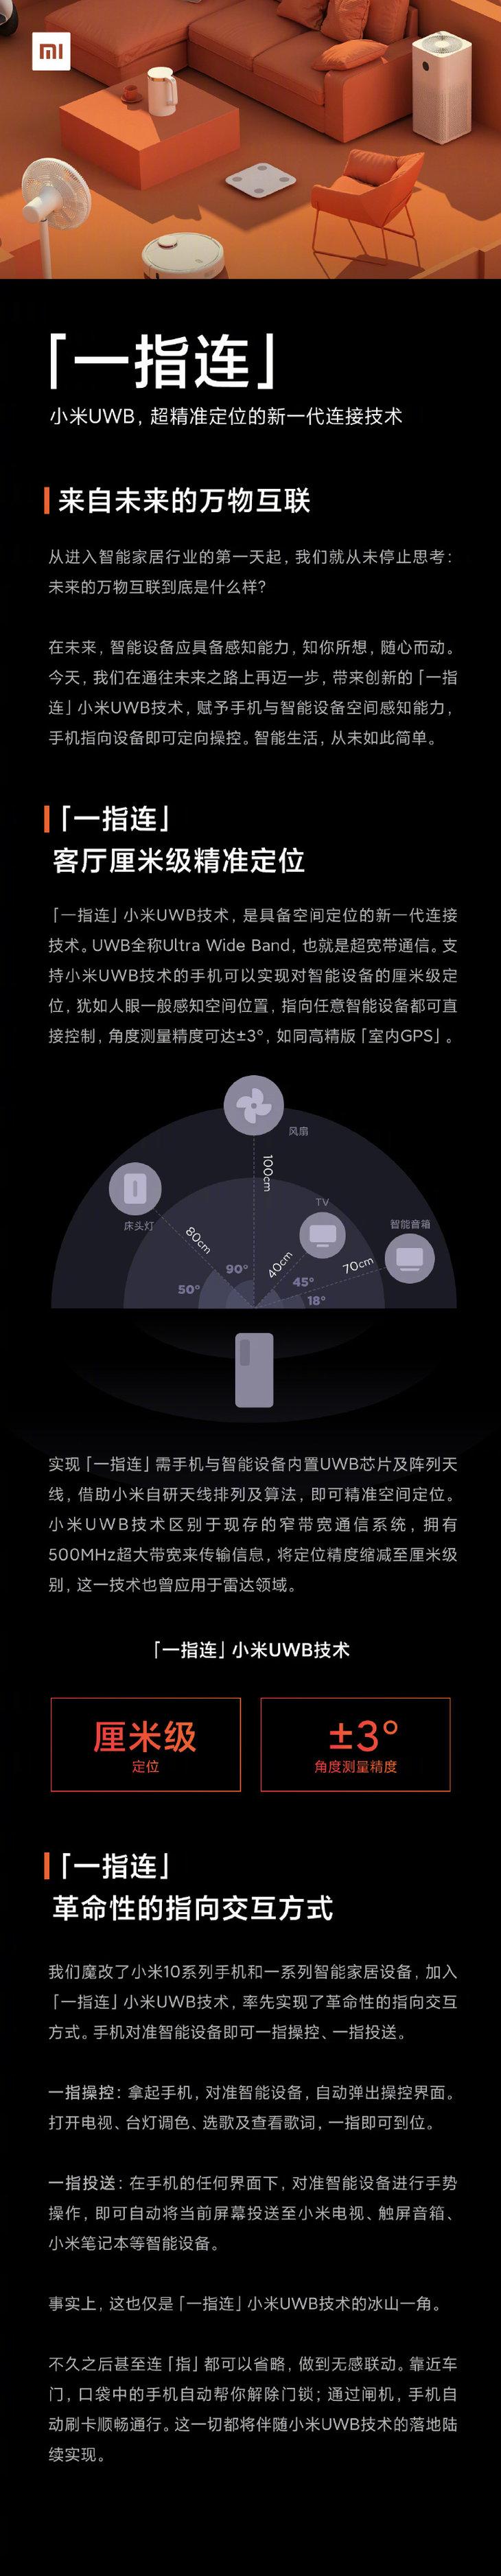 Xiaomi UWB technology